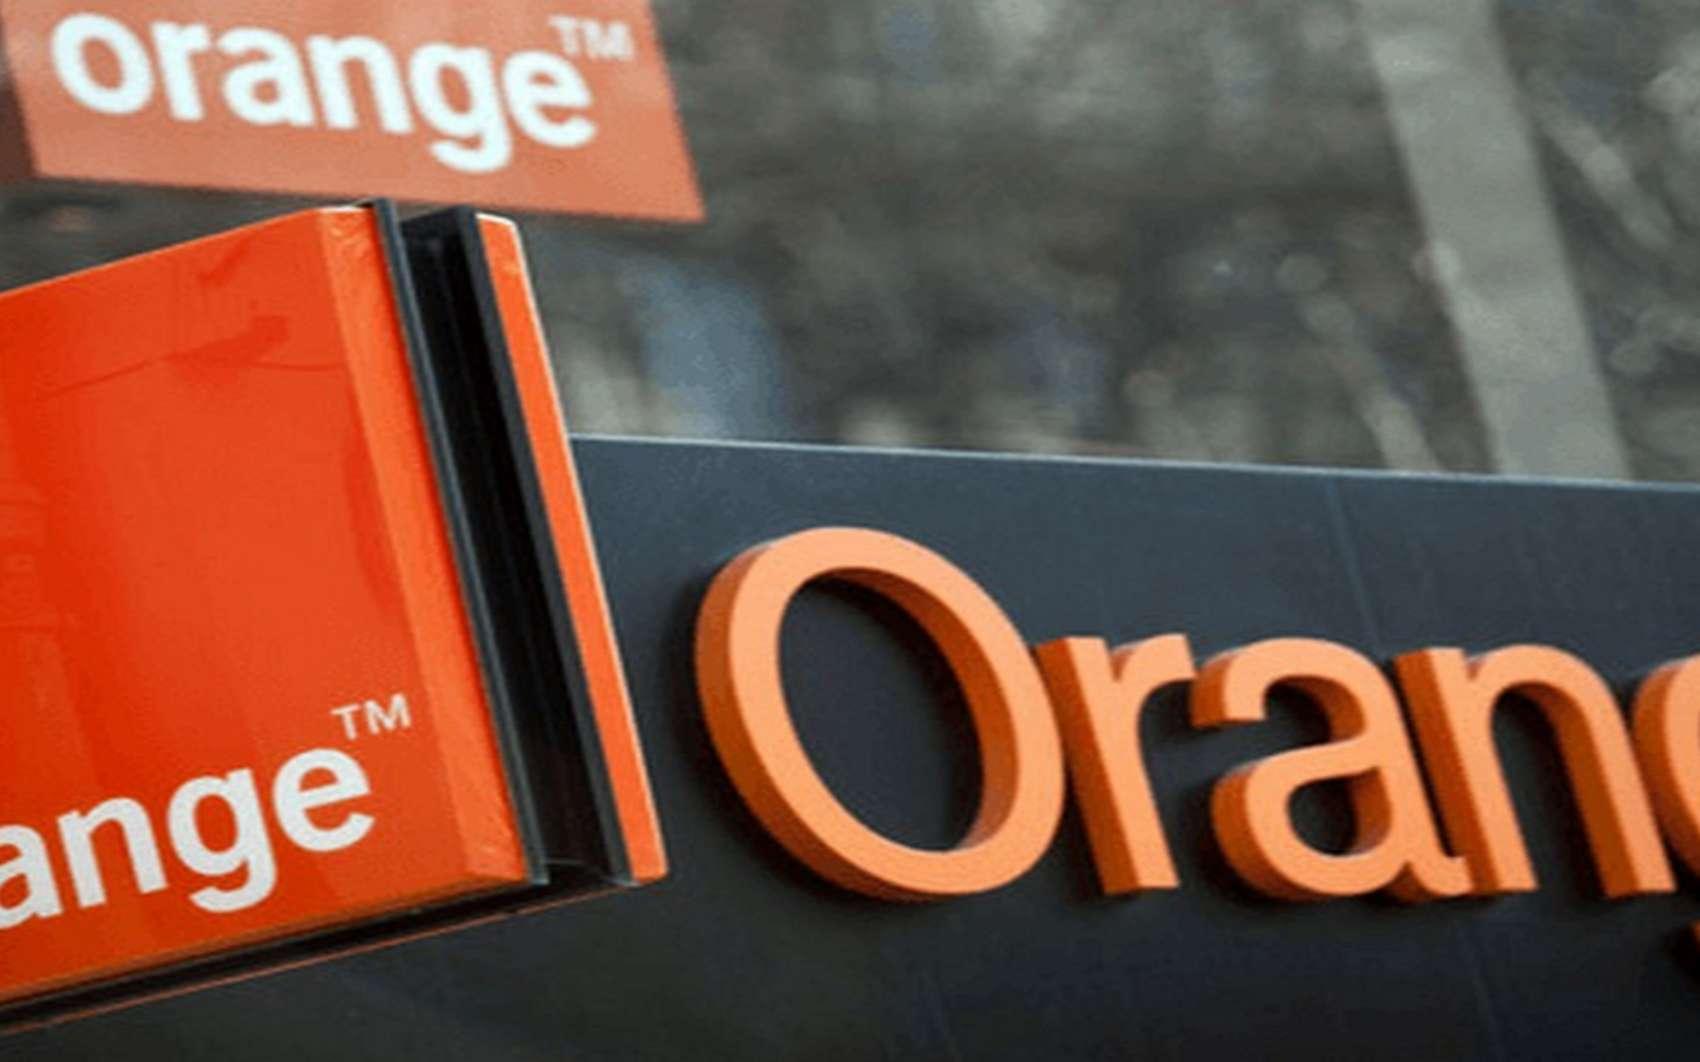 Orange meilleur débit internet fixe © Orange